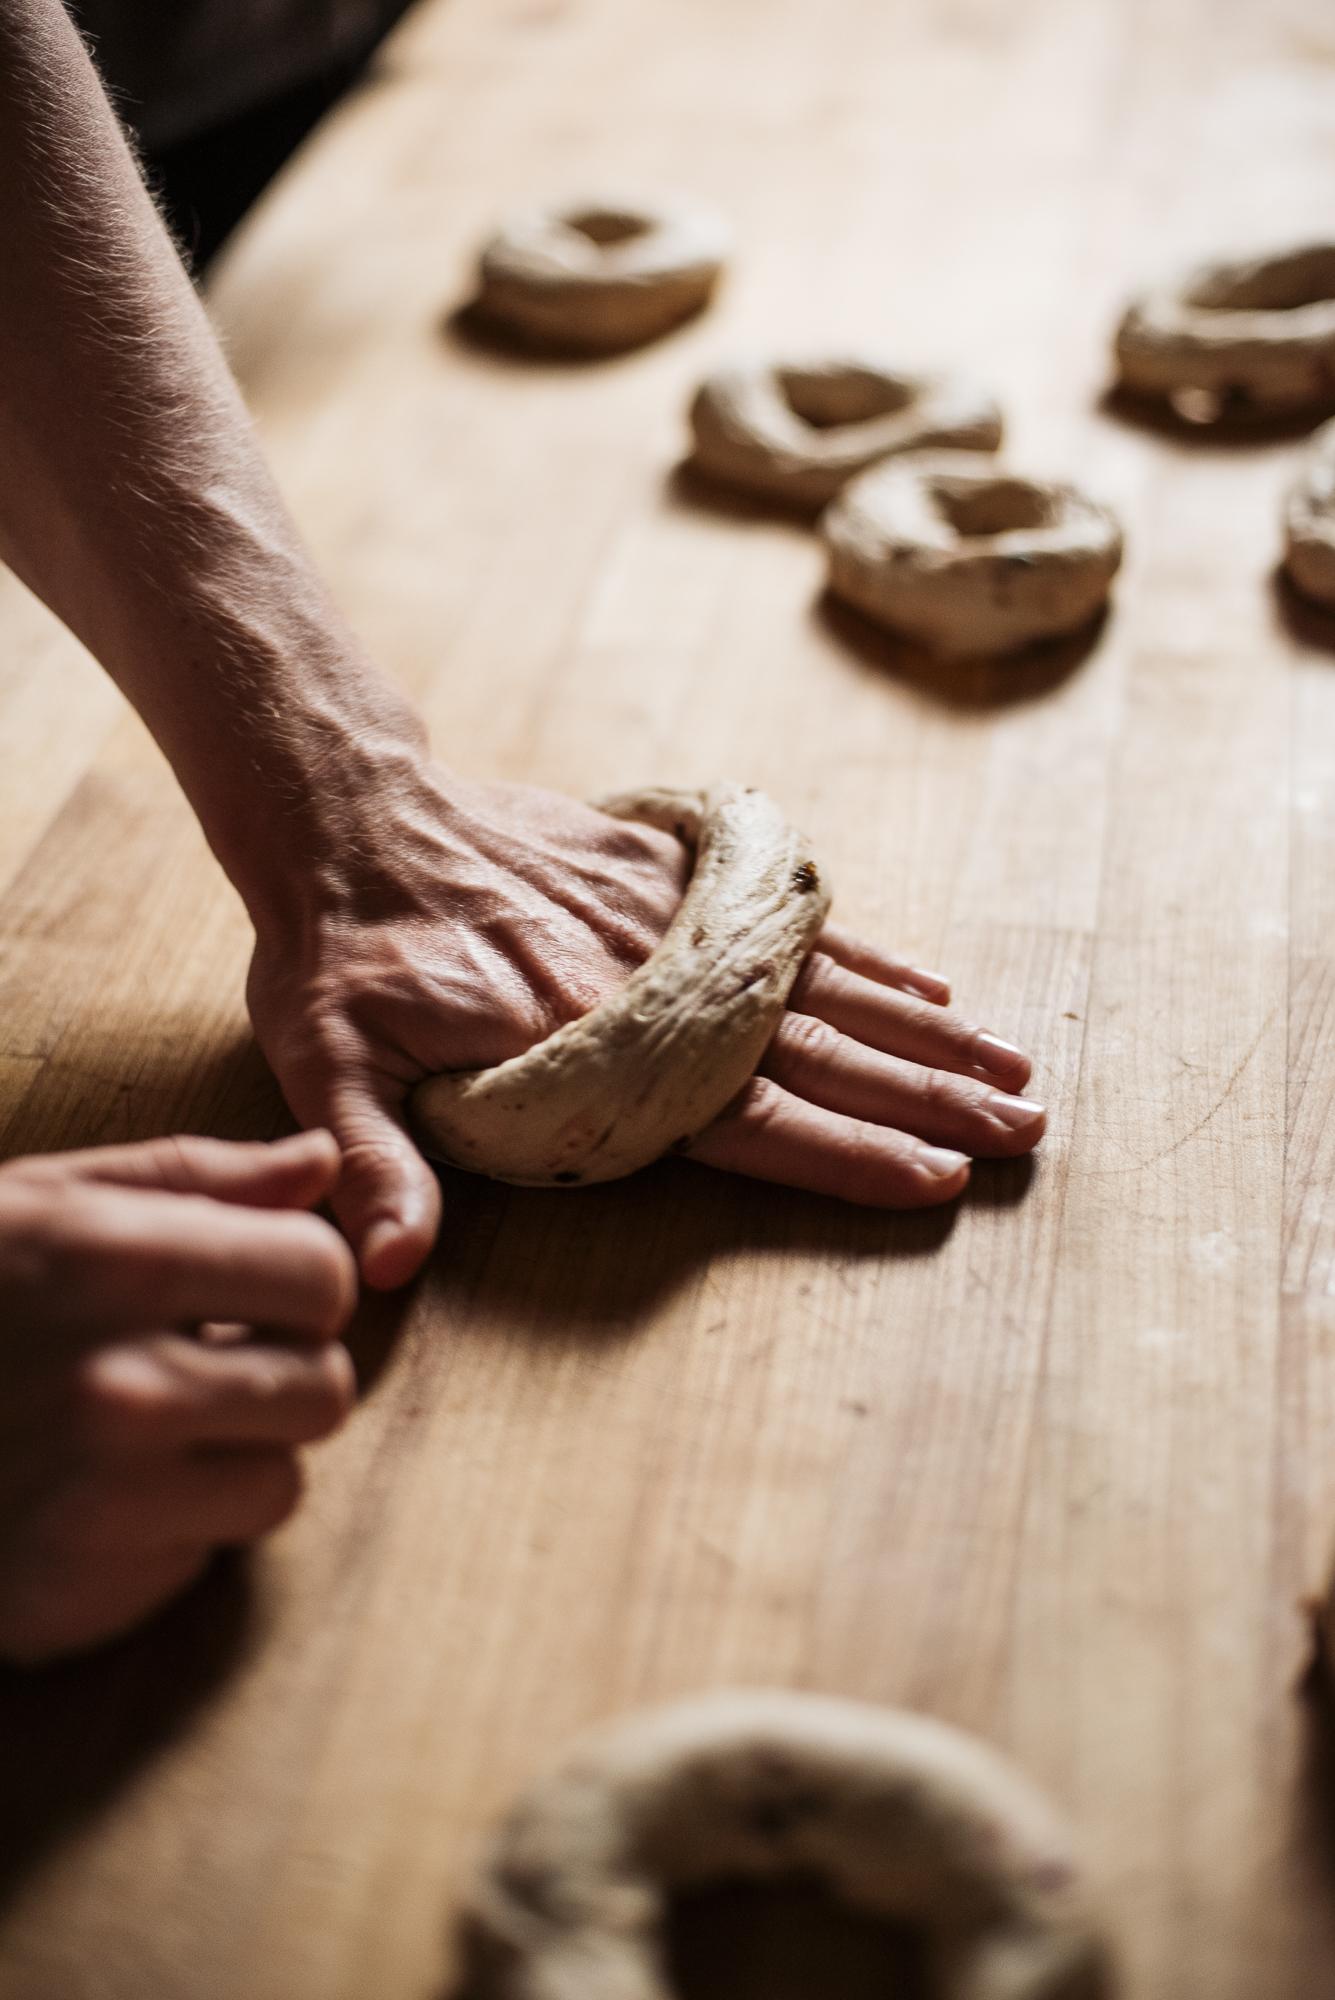 Home Free Bagels  Jack Sorokin Flame Food Photographer Asheville North Carolina NC Bakery Commercial Photography dough kneading